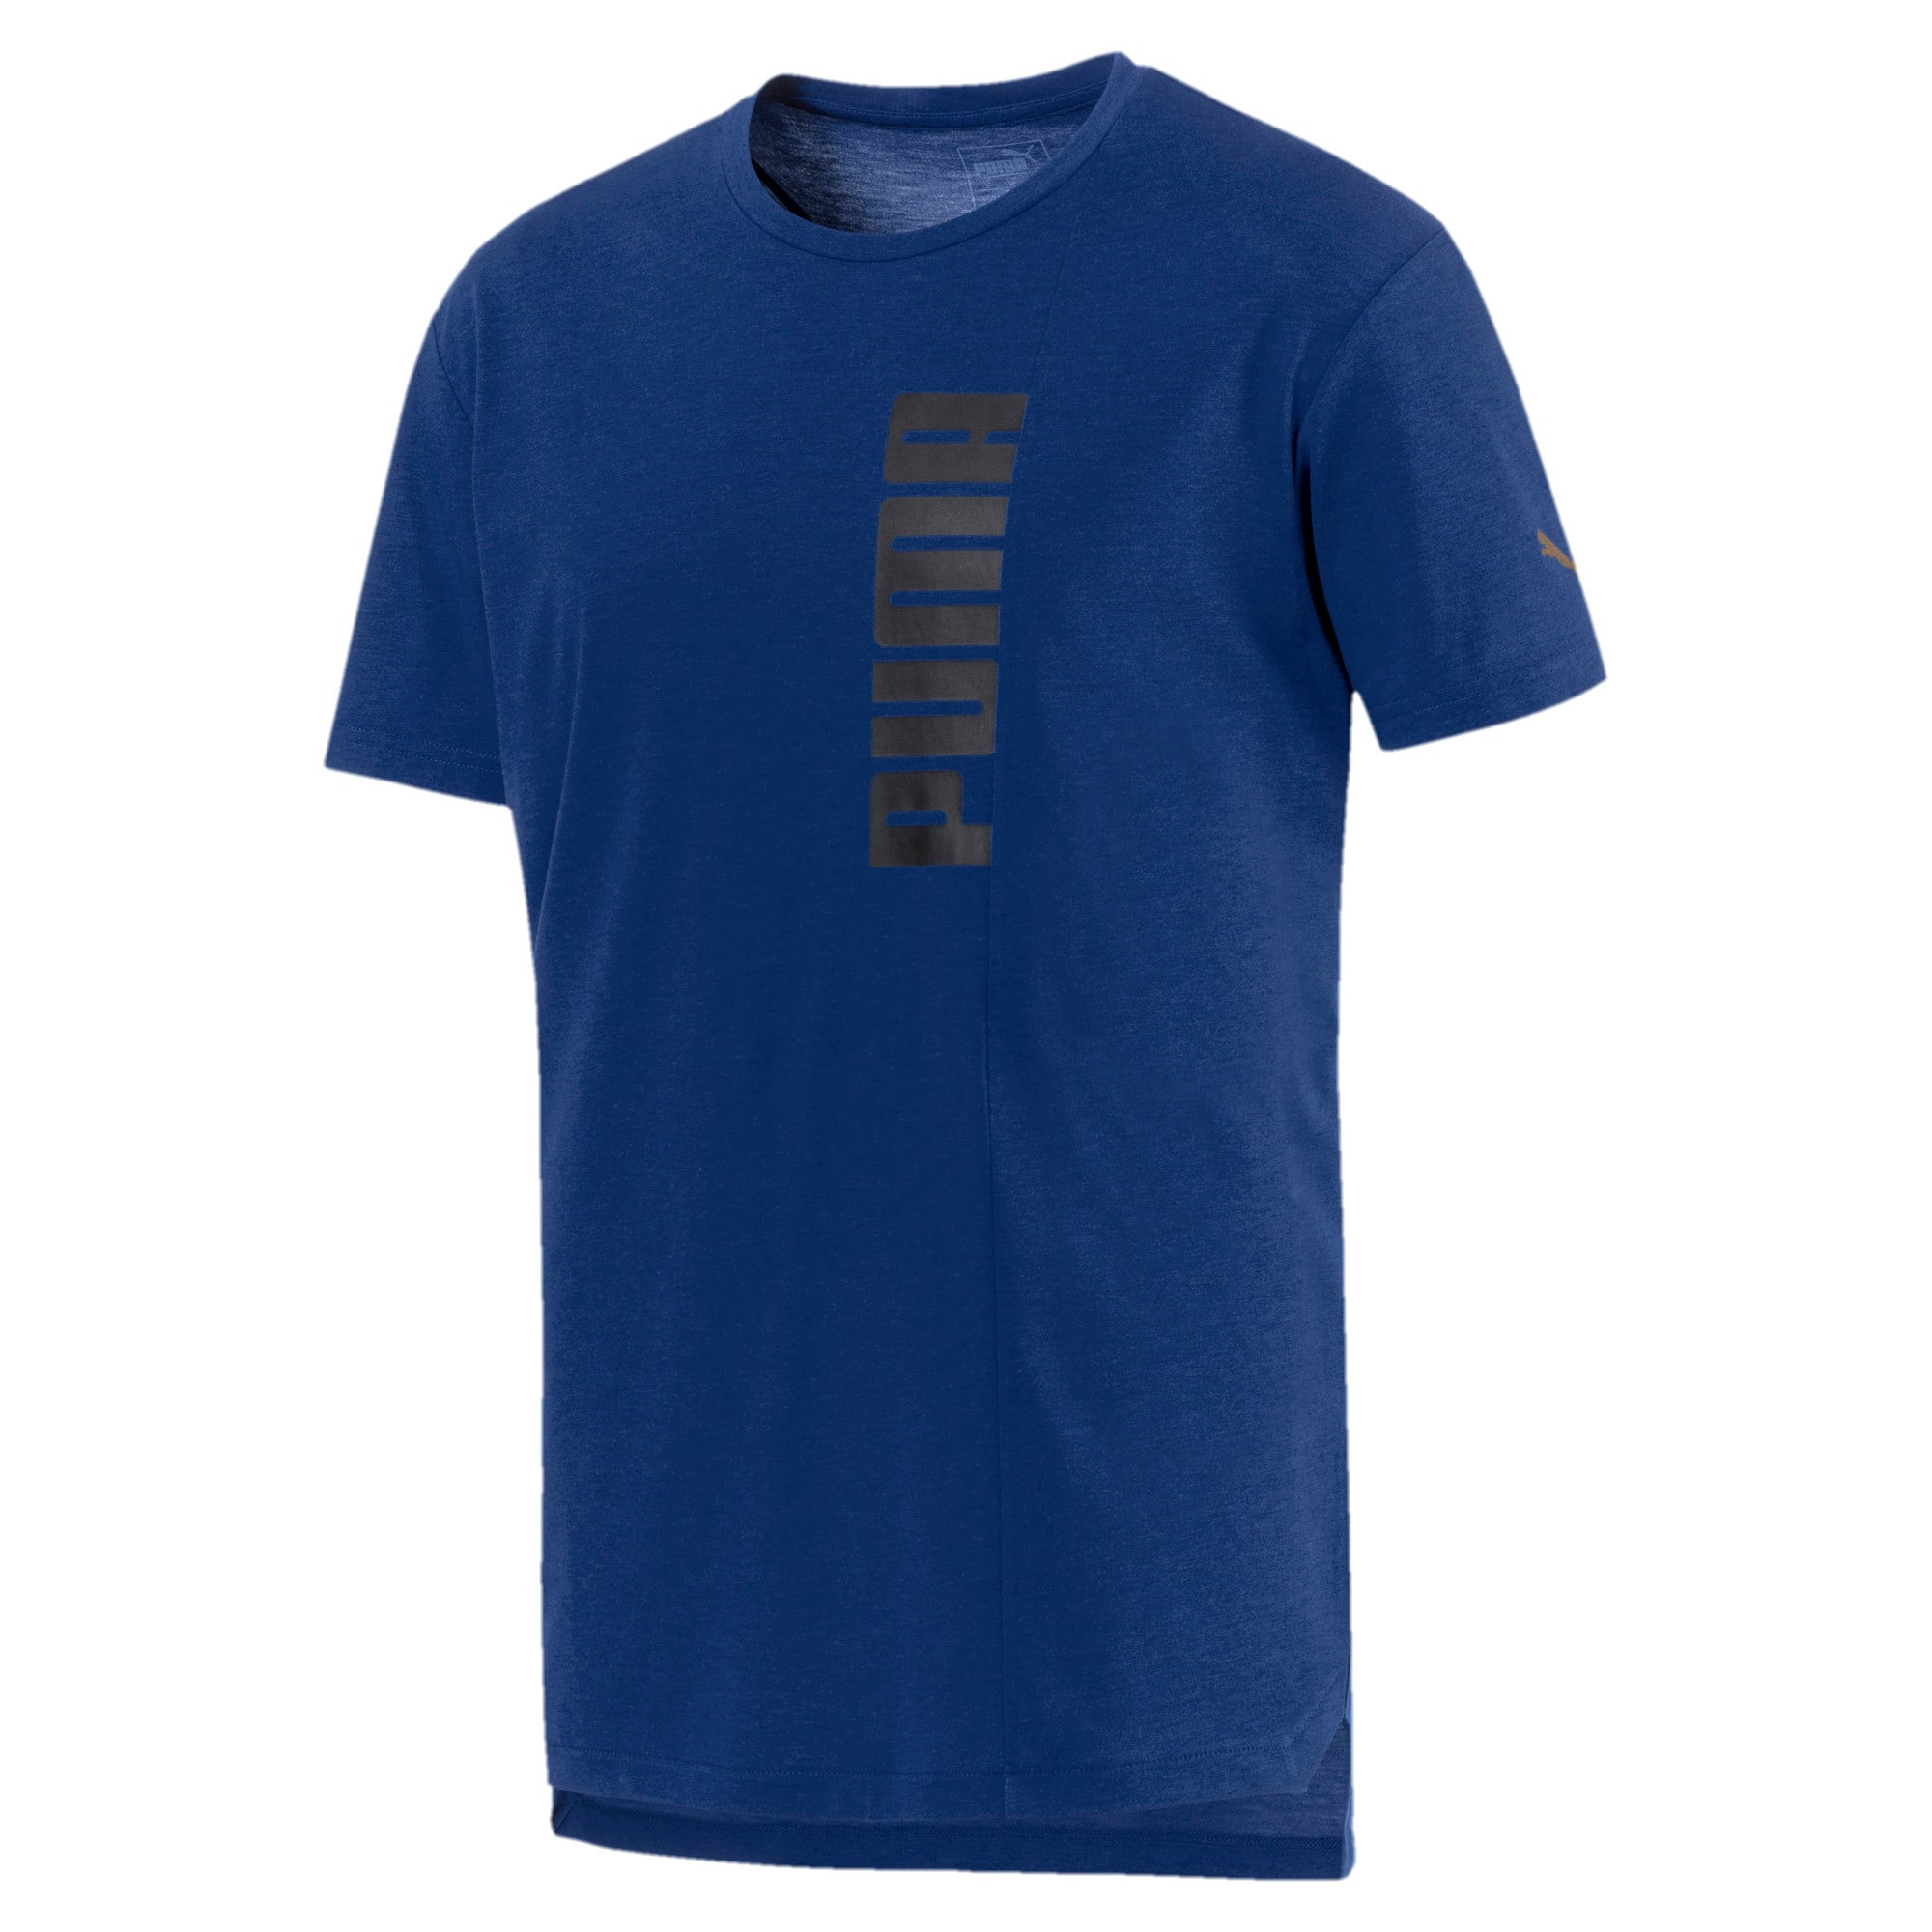 Thumbnail 4 of Energy Triblend Graphic Men's Running Tee, Sodalite Blue, medium-IND